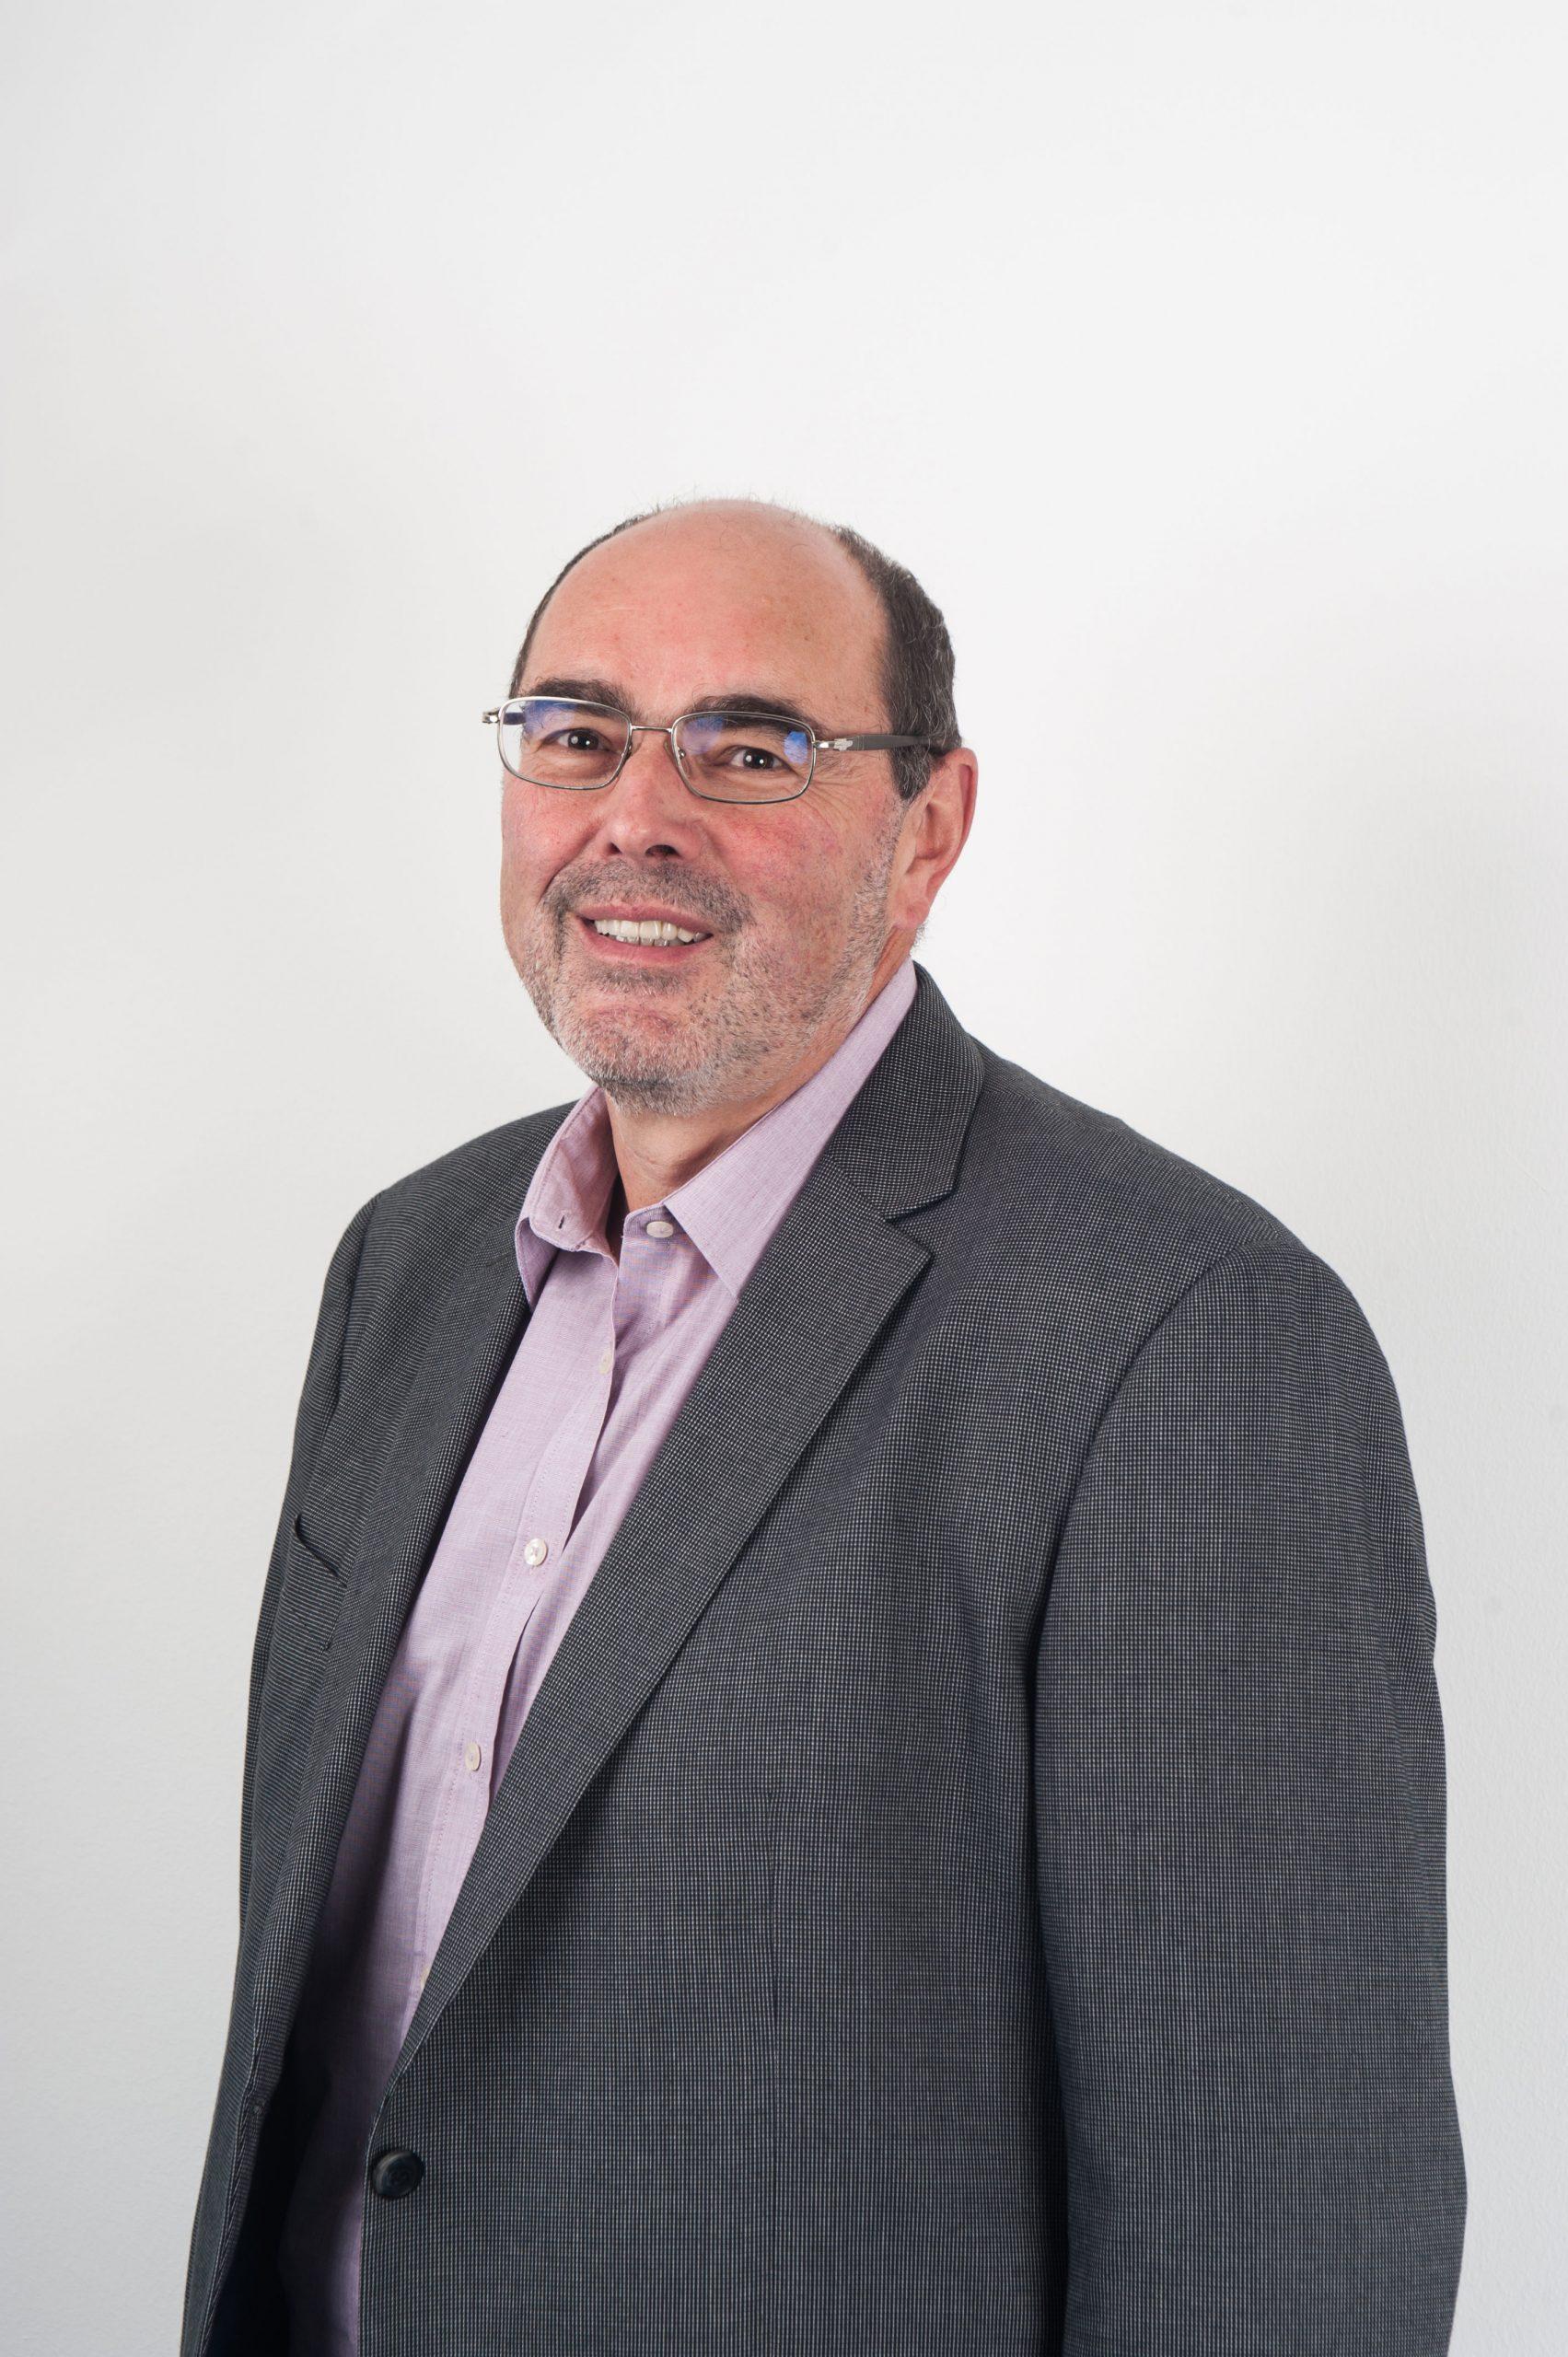 Andreas Duyvenbode - Kundenbetreuung ORLANDO WAWI